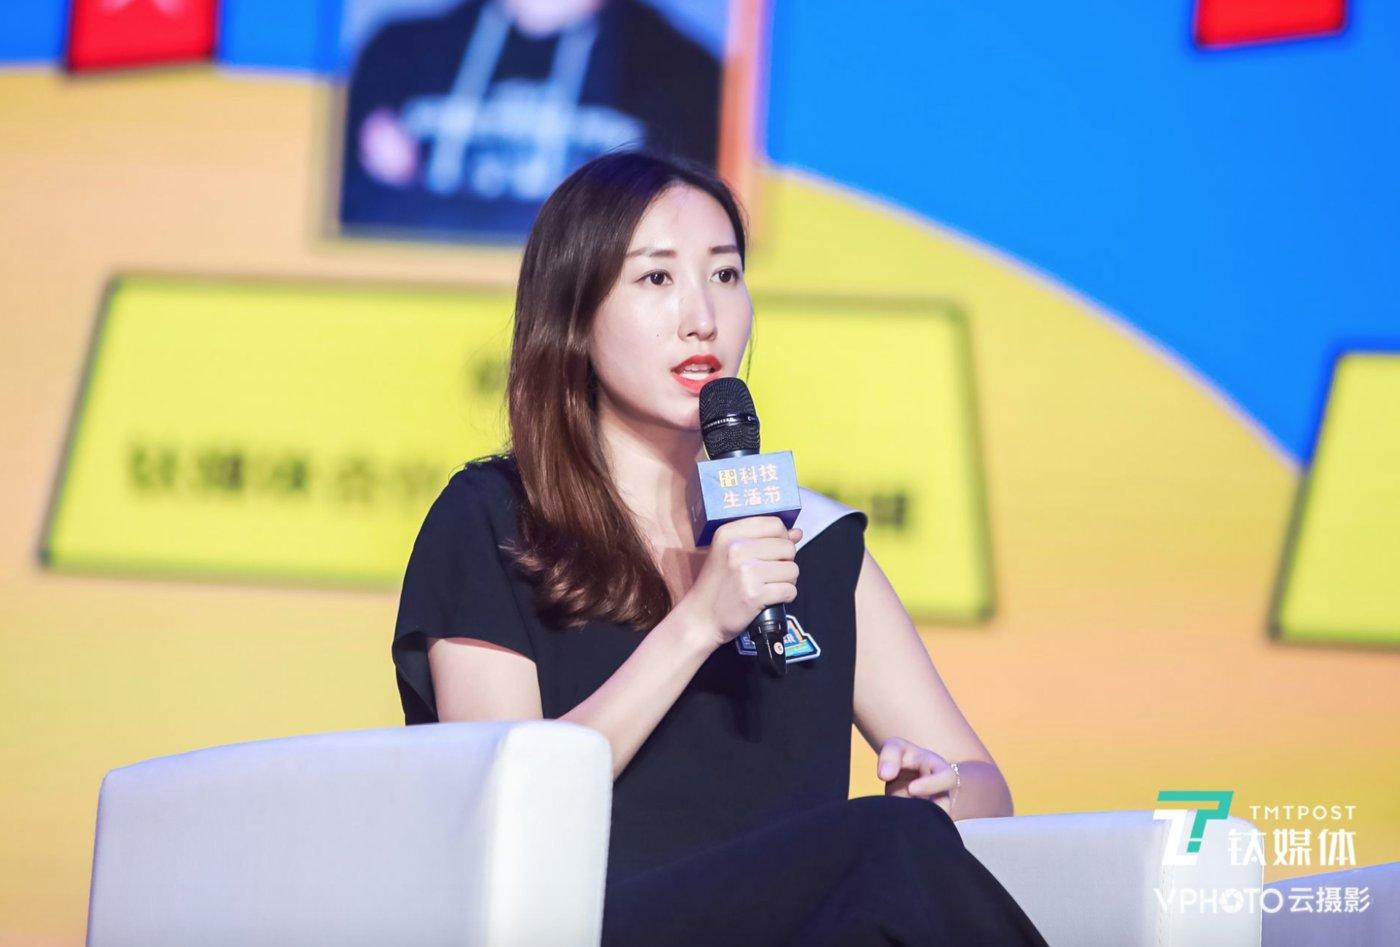 Onecup CEO 王旖含在2018钛媒体科技生活节